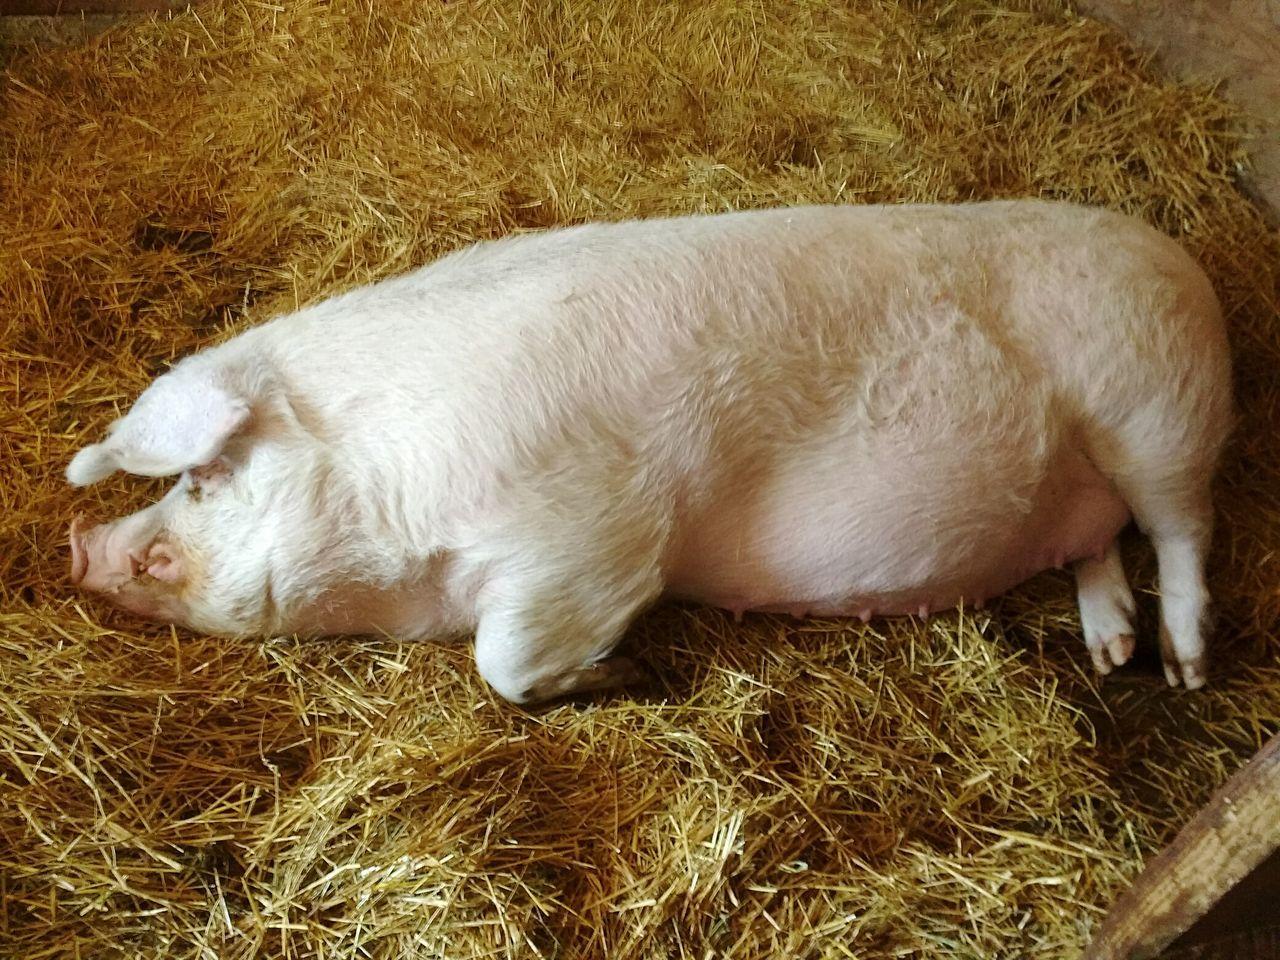 Big snoring pig Pig Sow Sleeping Pig Bed Straw Hay Piggy Oink Animal Themes Farm Zoo Toronto Islands Eye4photography  Canada Coast To Coast EyeEm Best Shots Enjoying Life Getting Inspired Toronto Popular Photos Resting Ontario Nature Relaxing Pigs♥ Pigs Of Eyeem